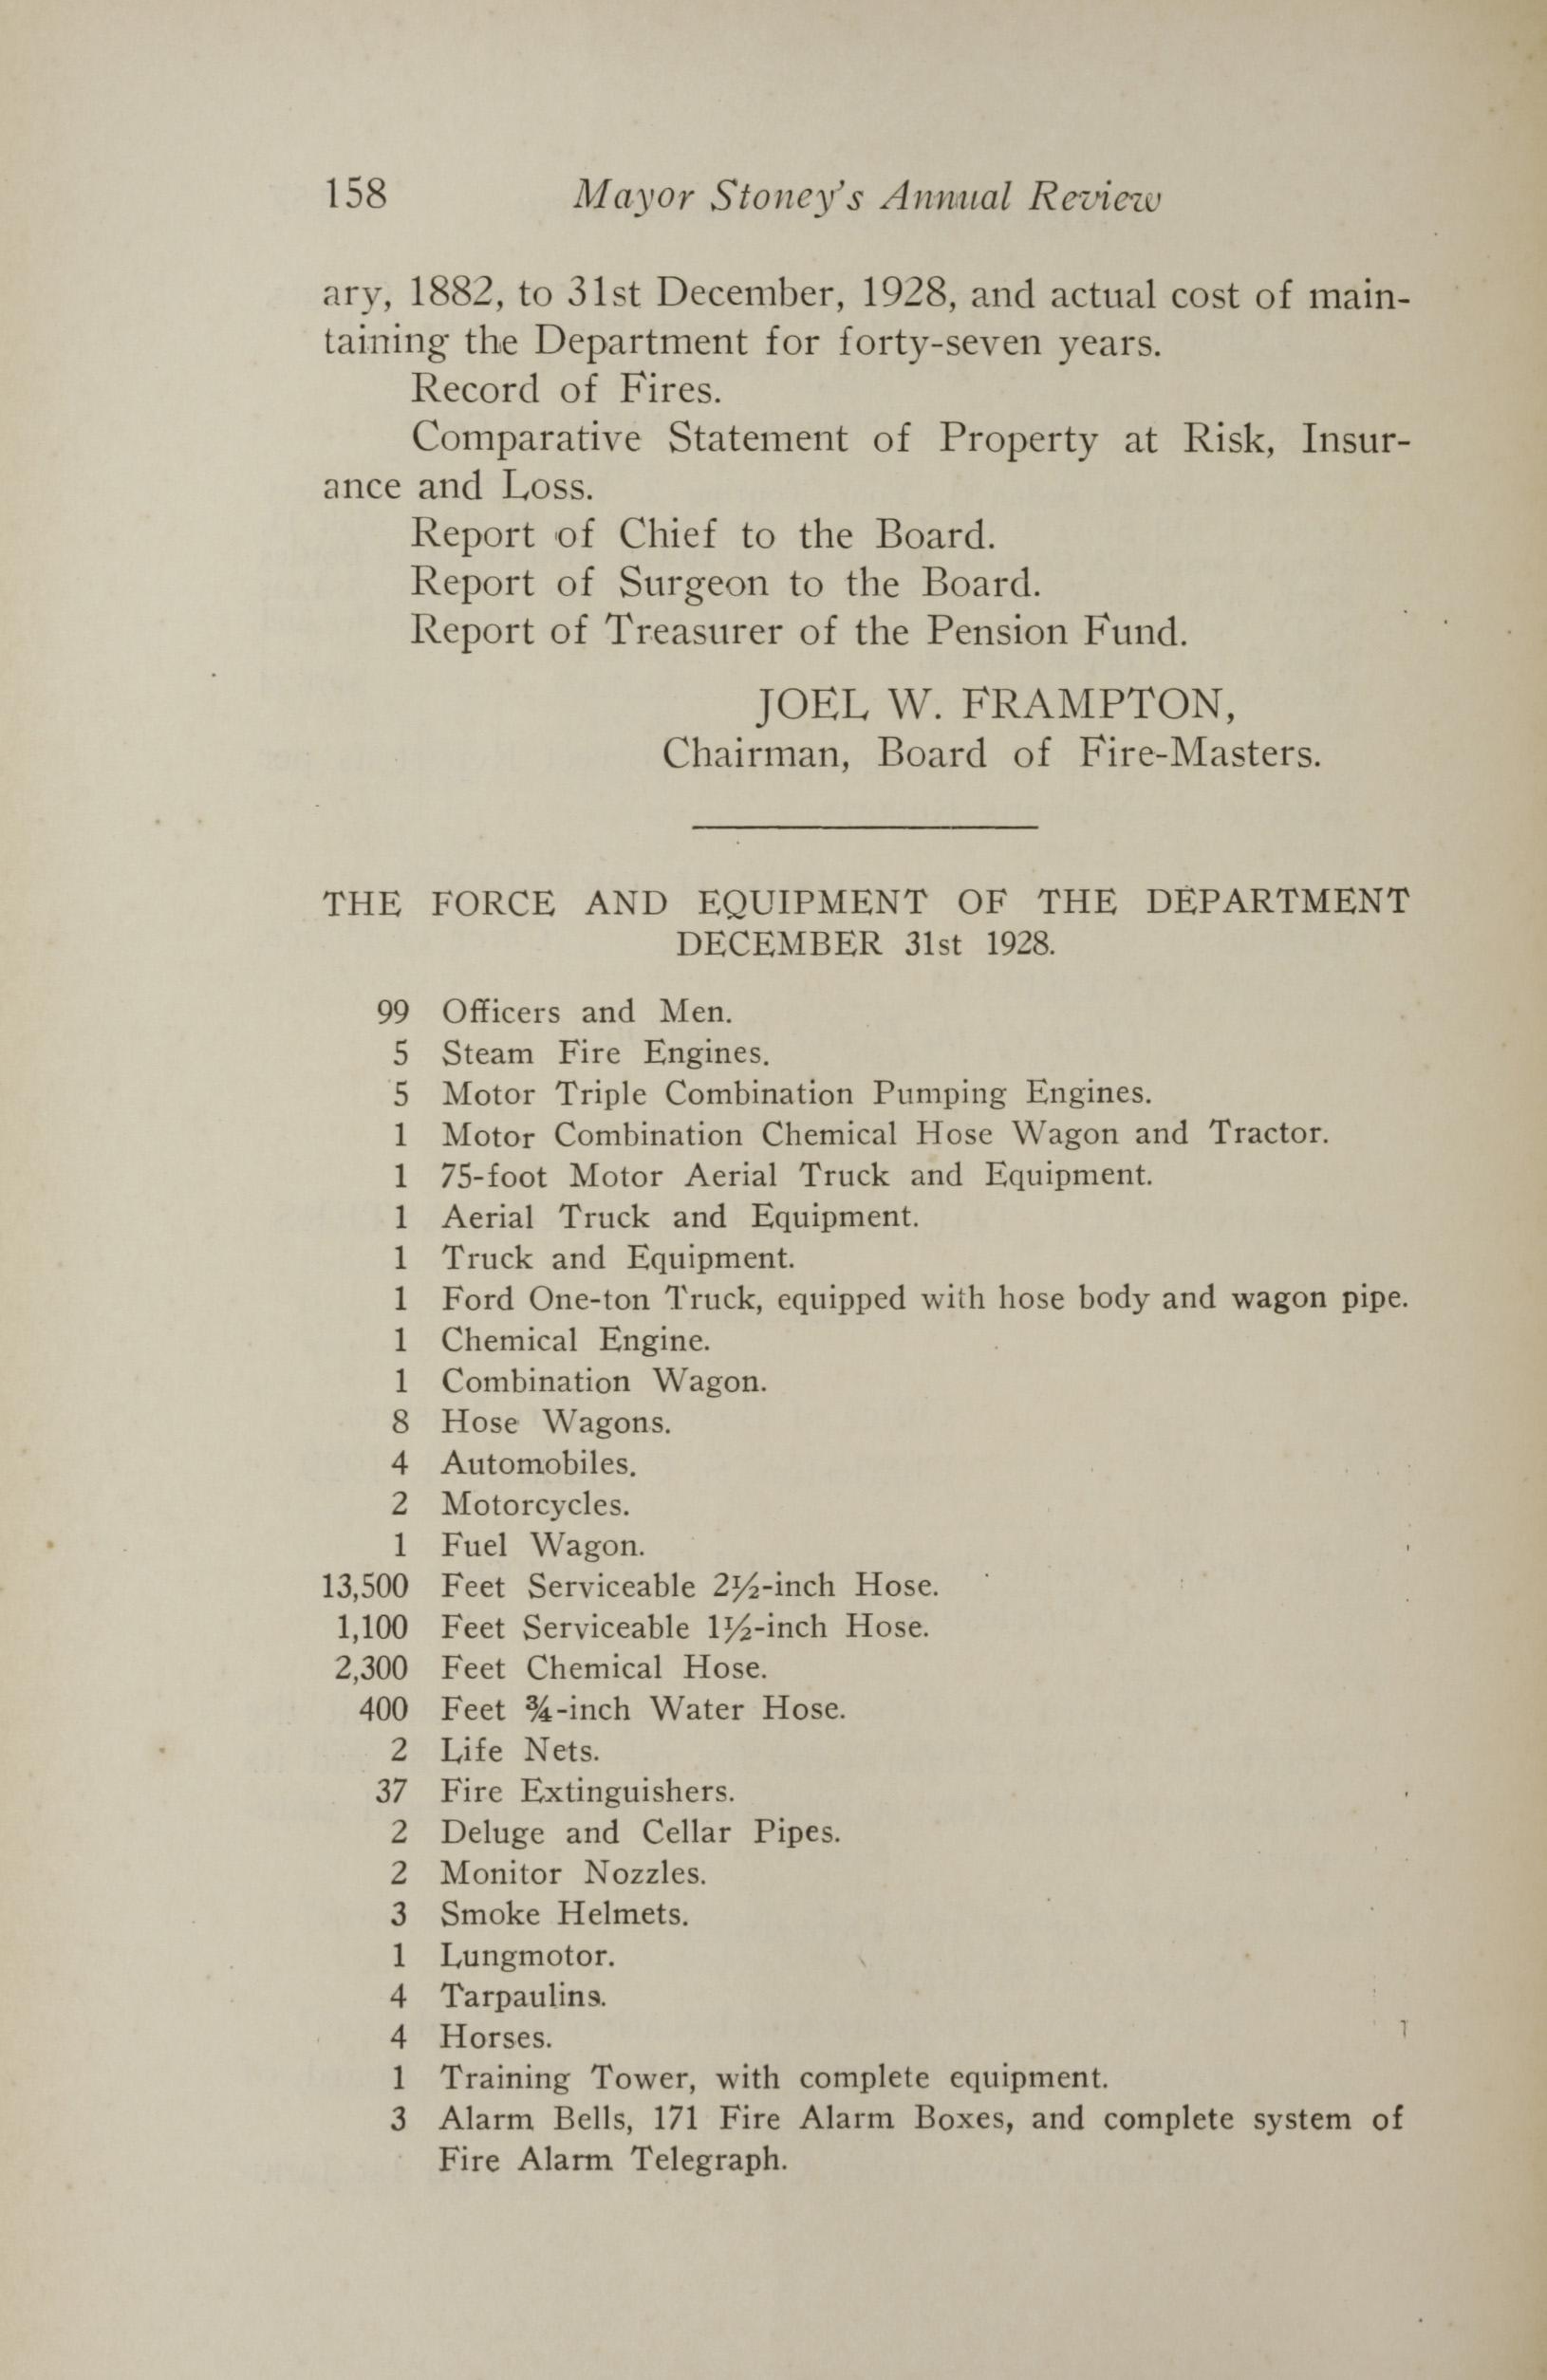 Charleston Yearbook, 1928, page 158